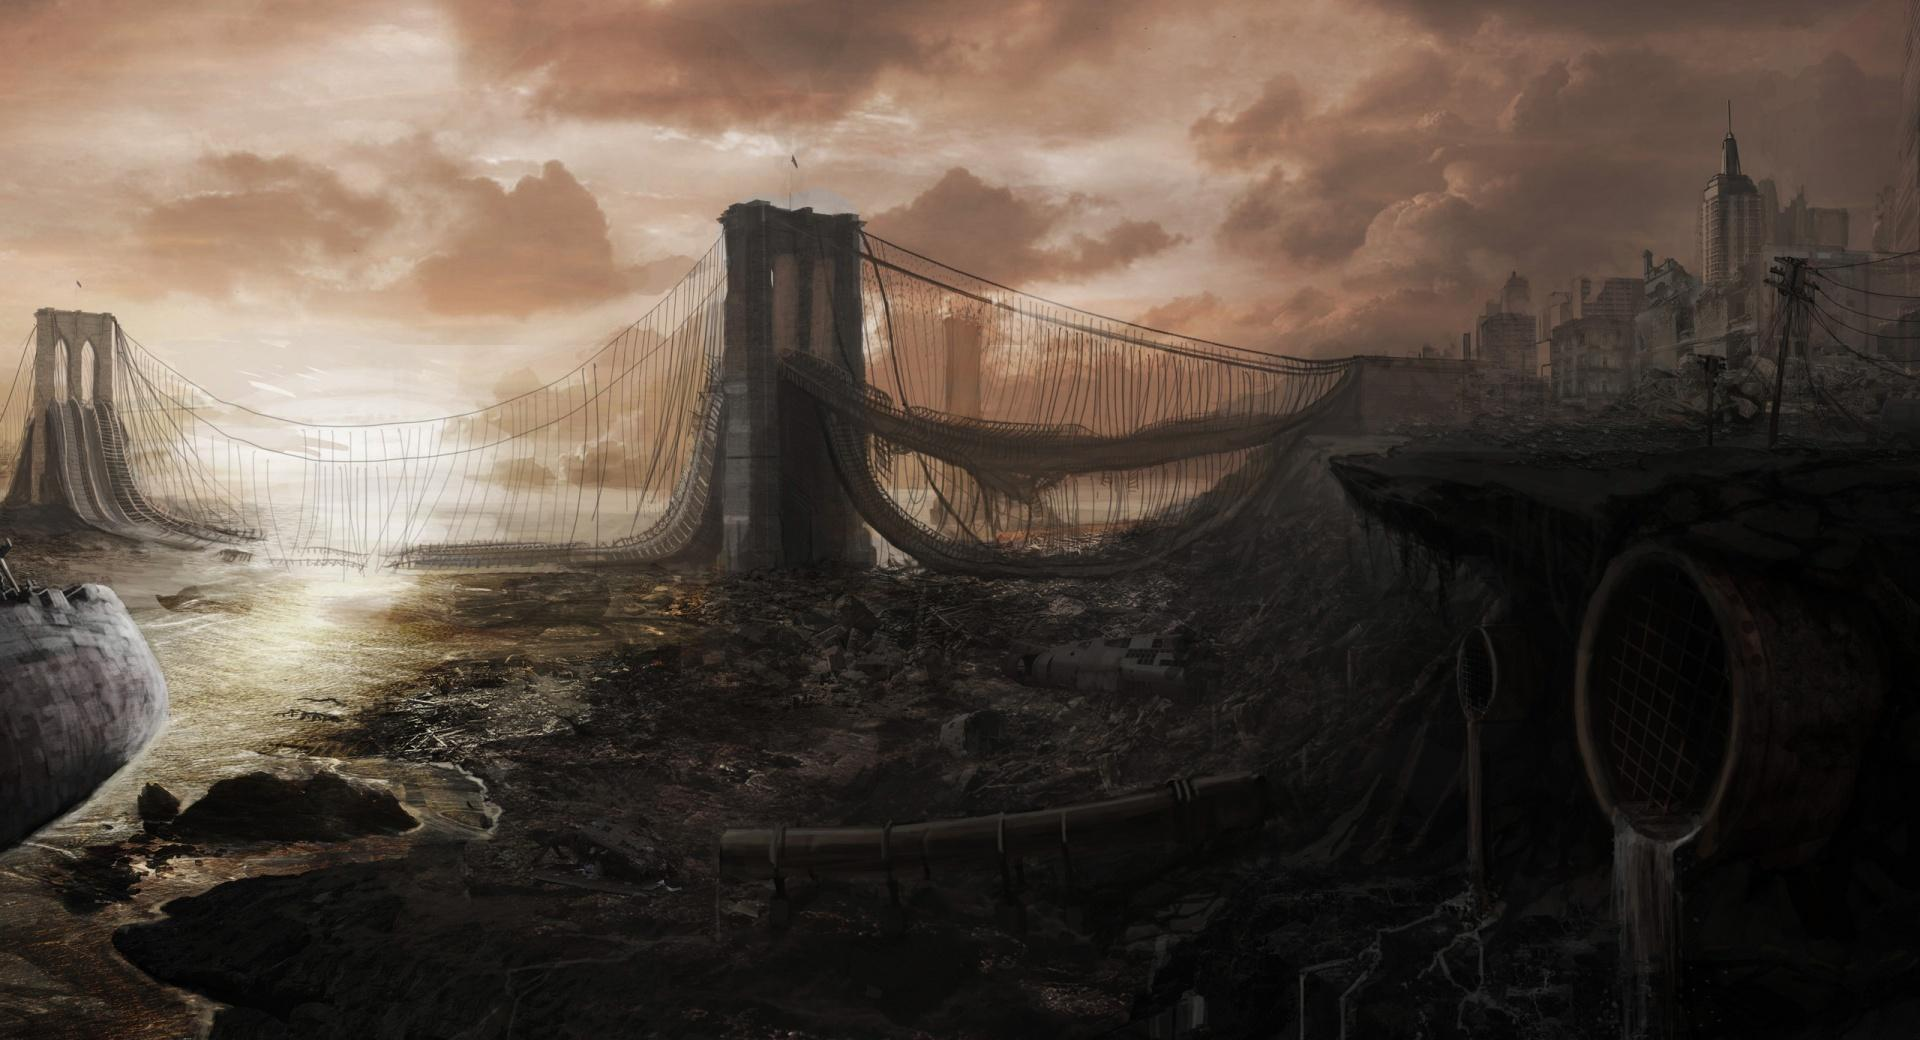 Brooklyn Bridge Ruins wallpapers HD quality